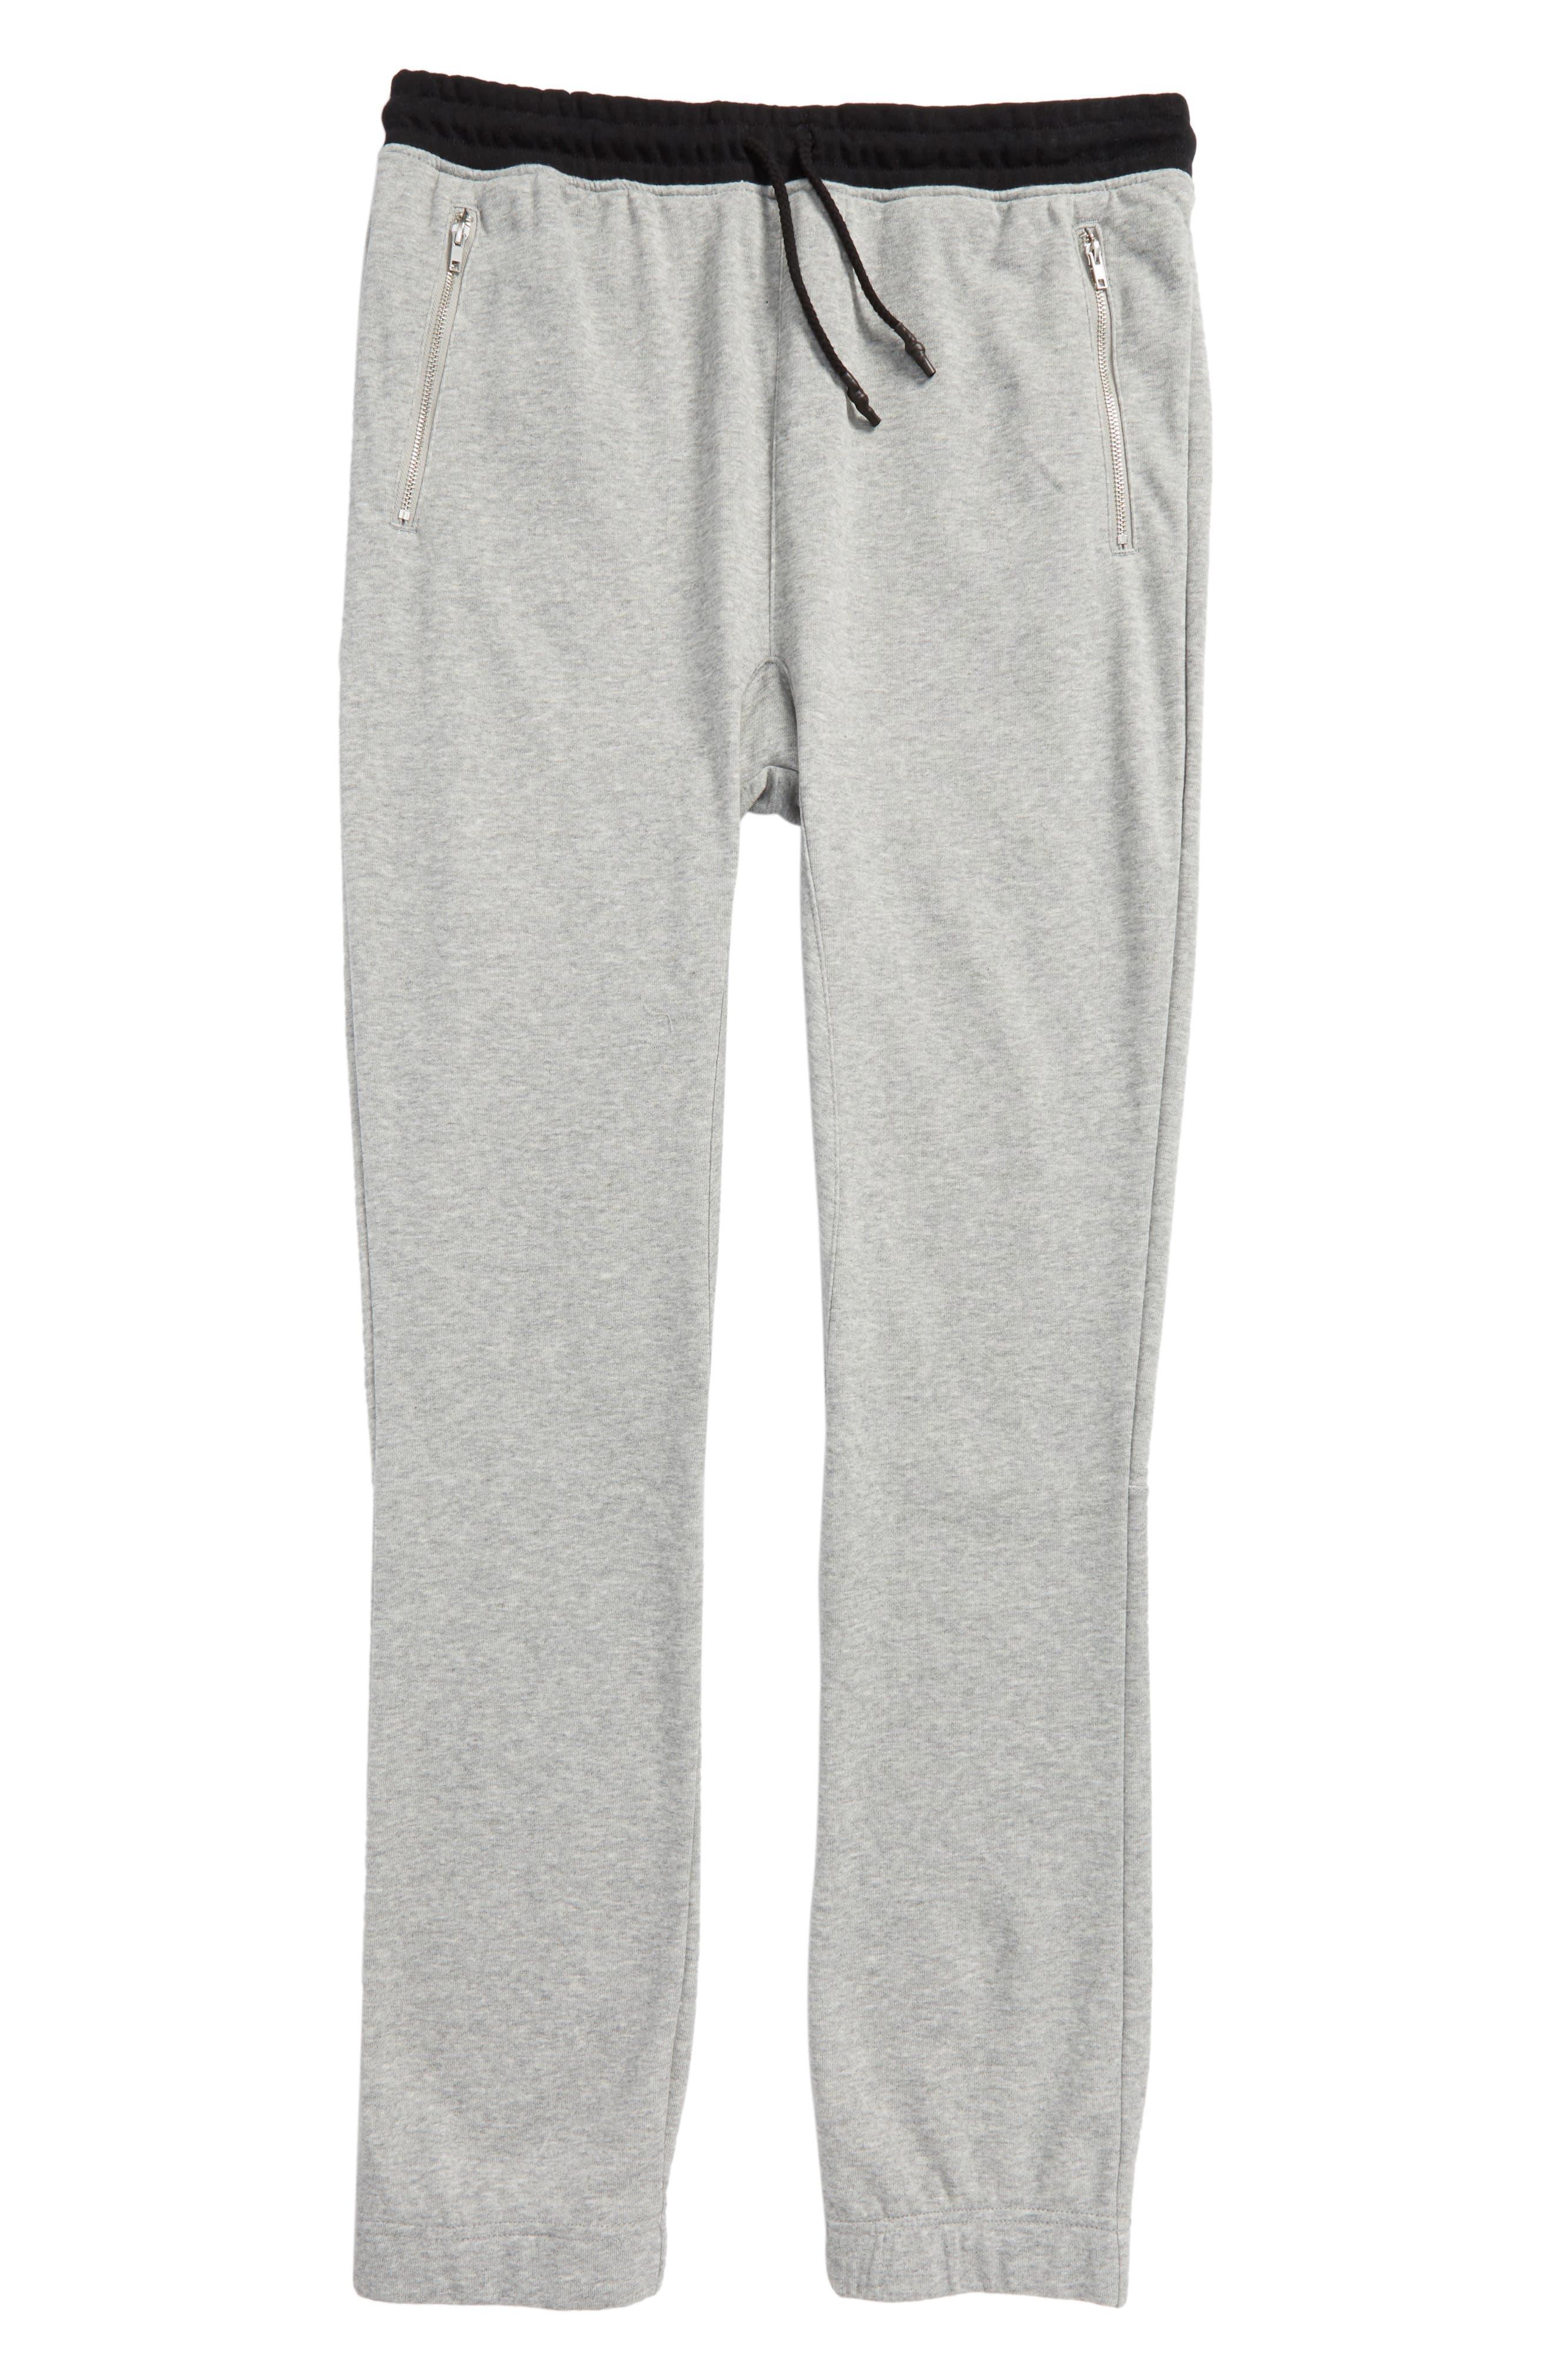 Jogger Pants,                         Main,                         color, Heather Grey/ Black